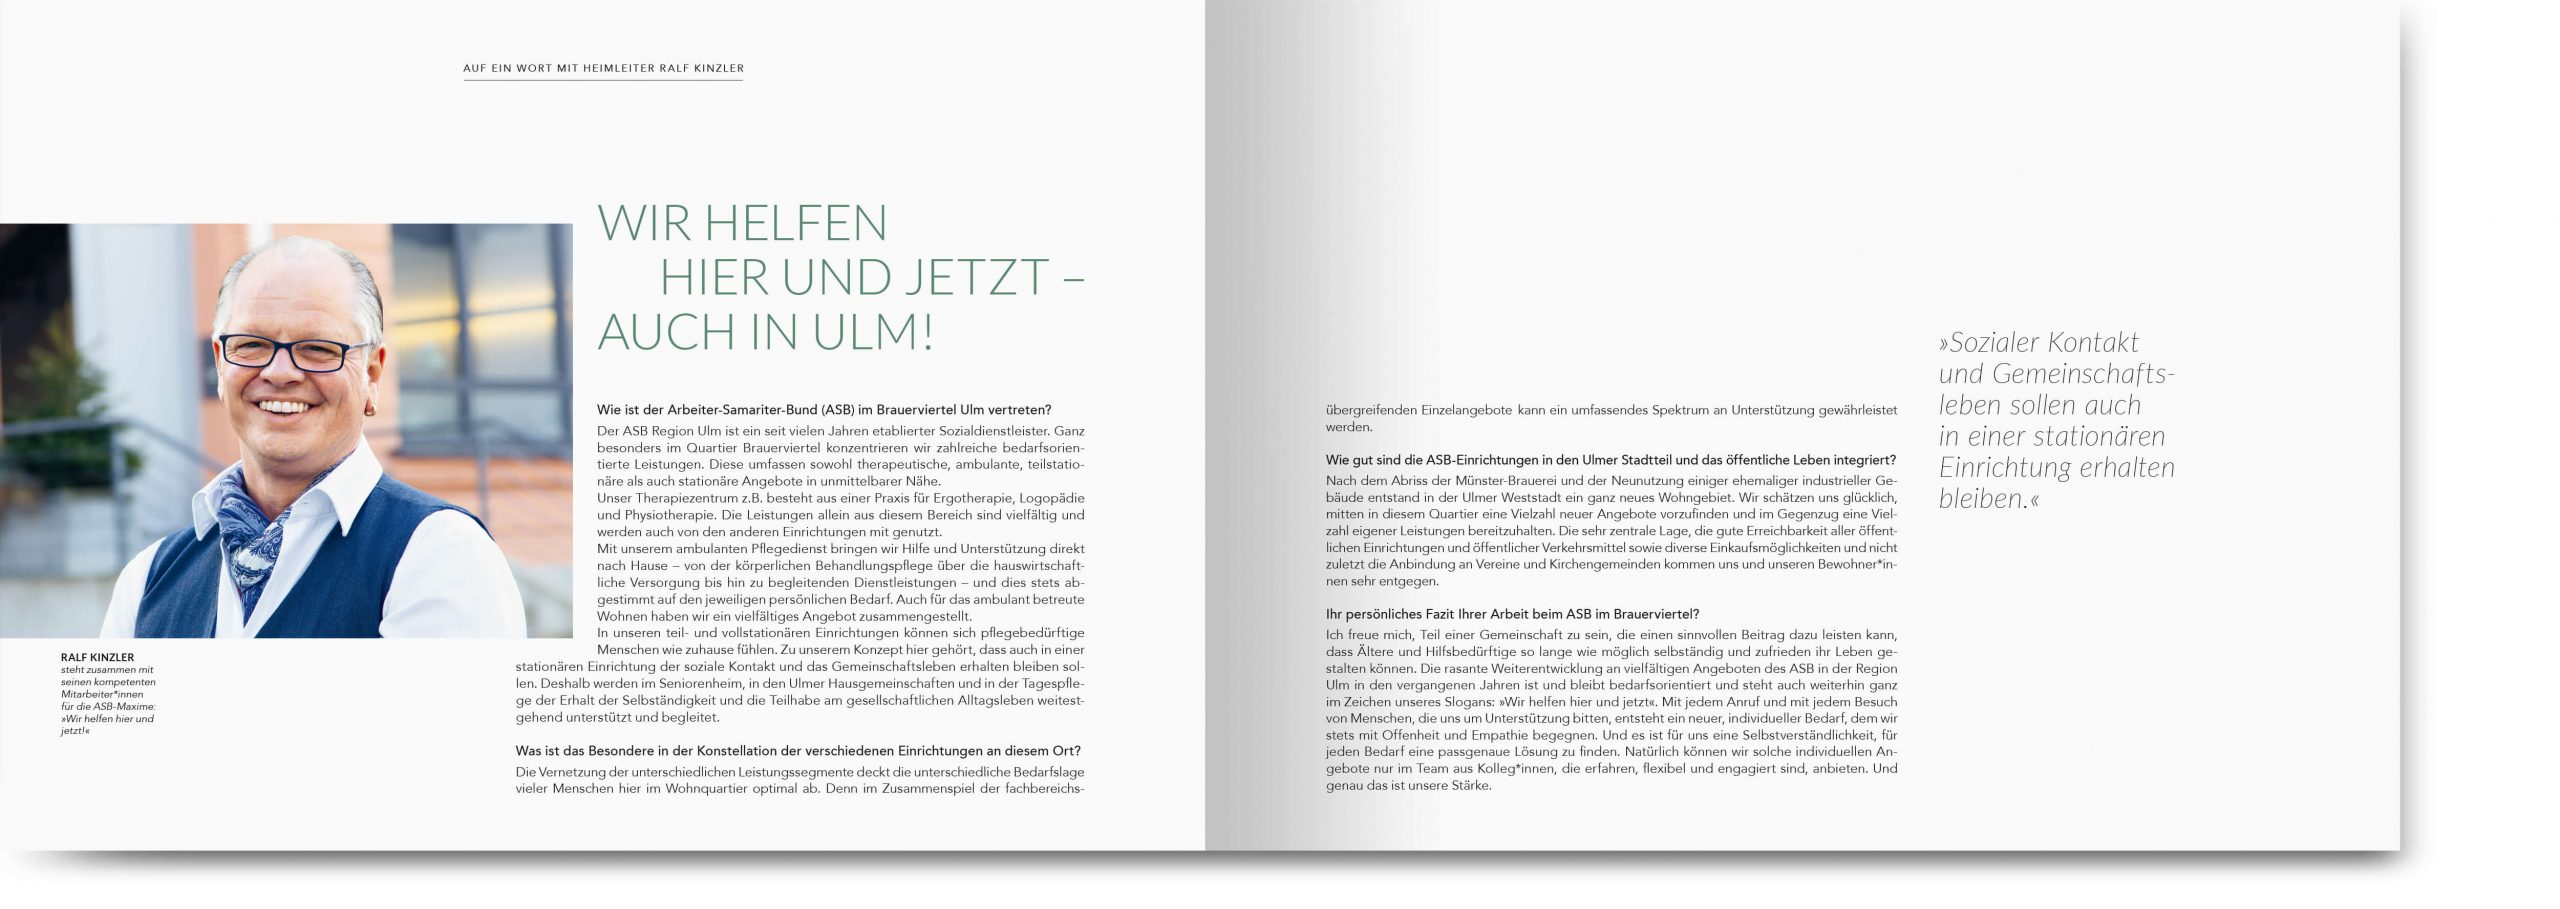 fh-web-asb-broschüren-ulm-2-scaled.jpg